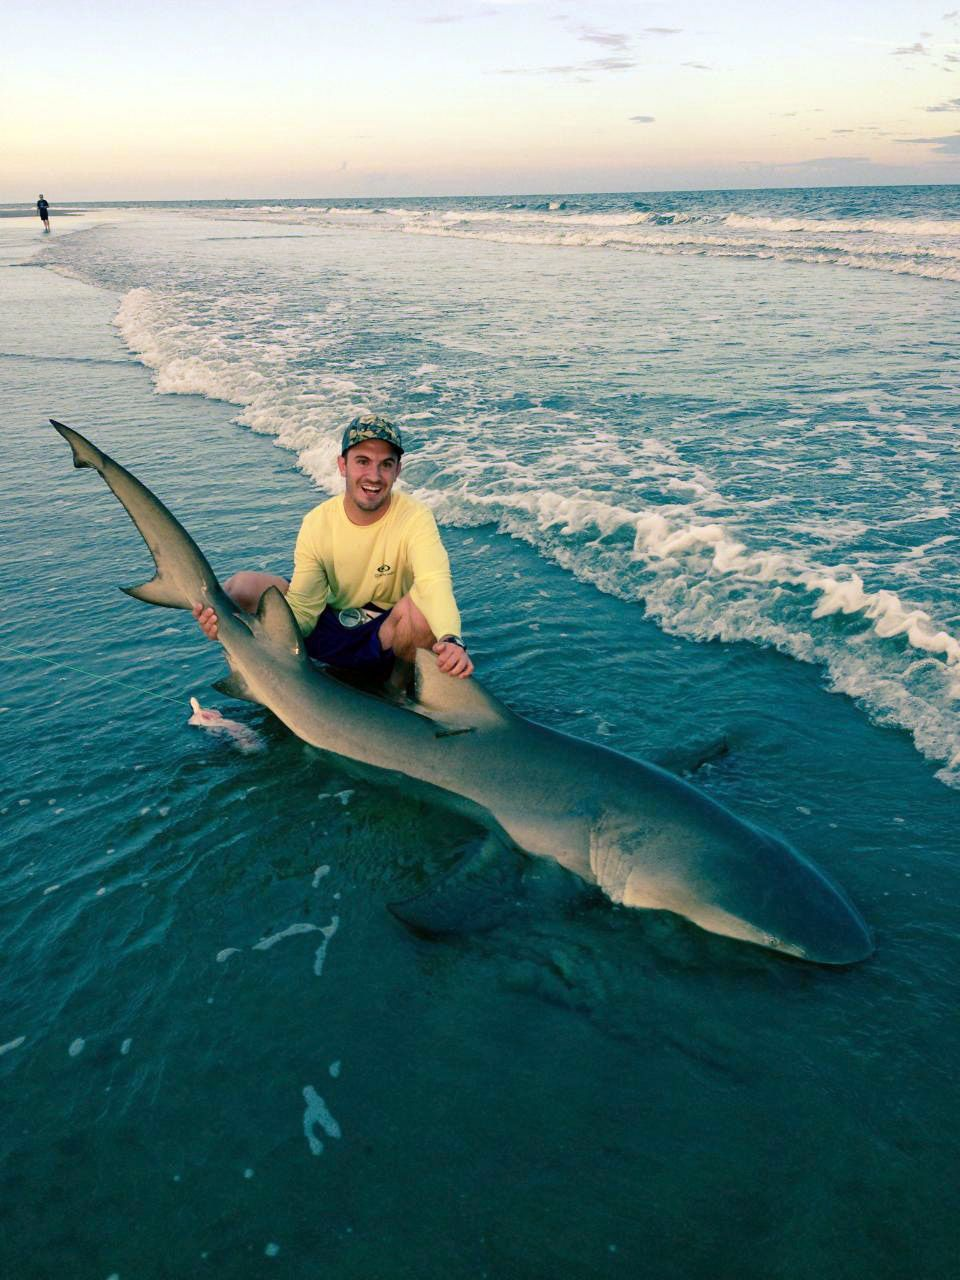 Angler hauls in 10-foot shark on Isle of Palms hy hy yhhhh